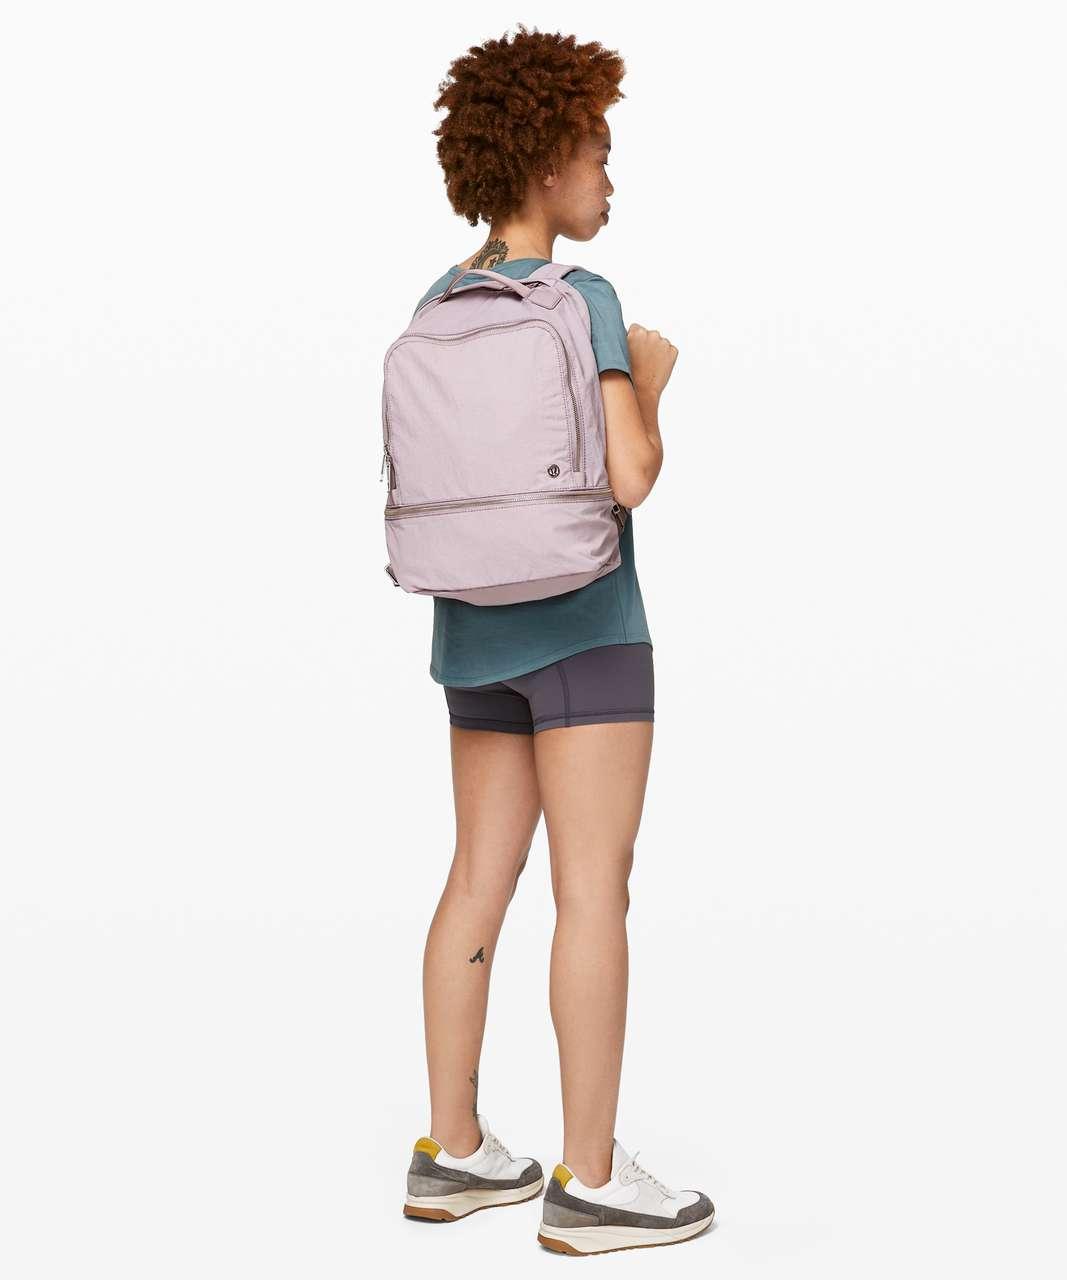 Lululemon City Adventurer Backpack *17L - Smoky Blush